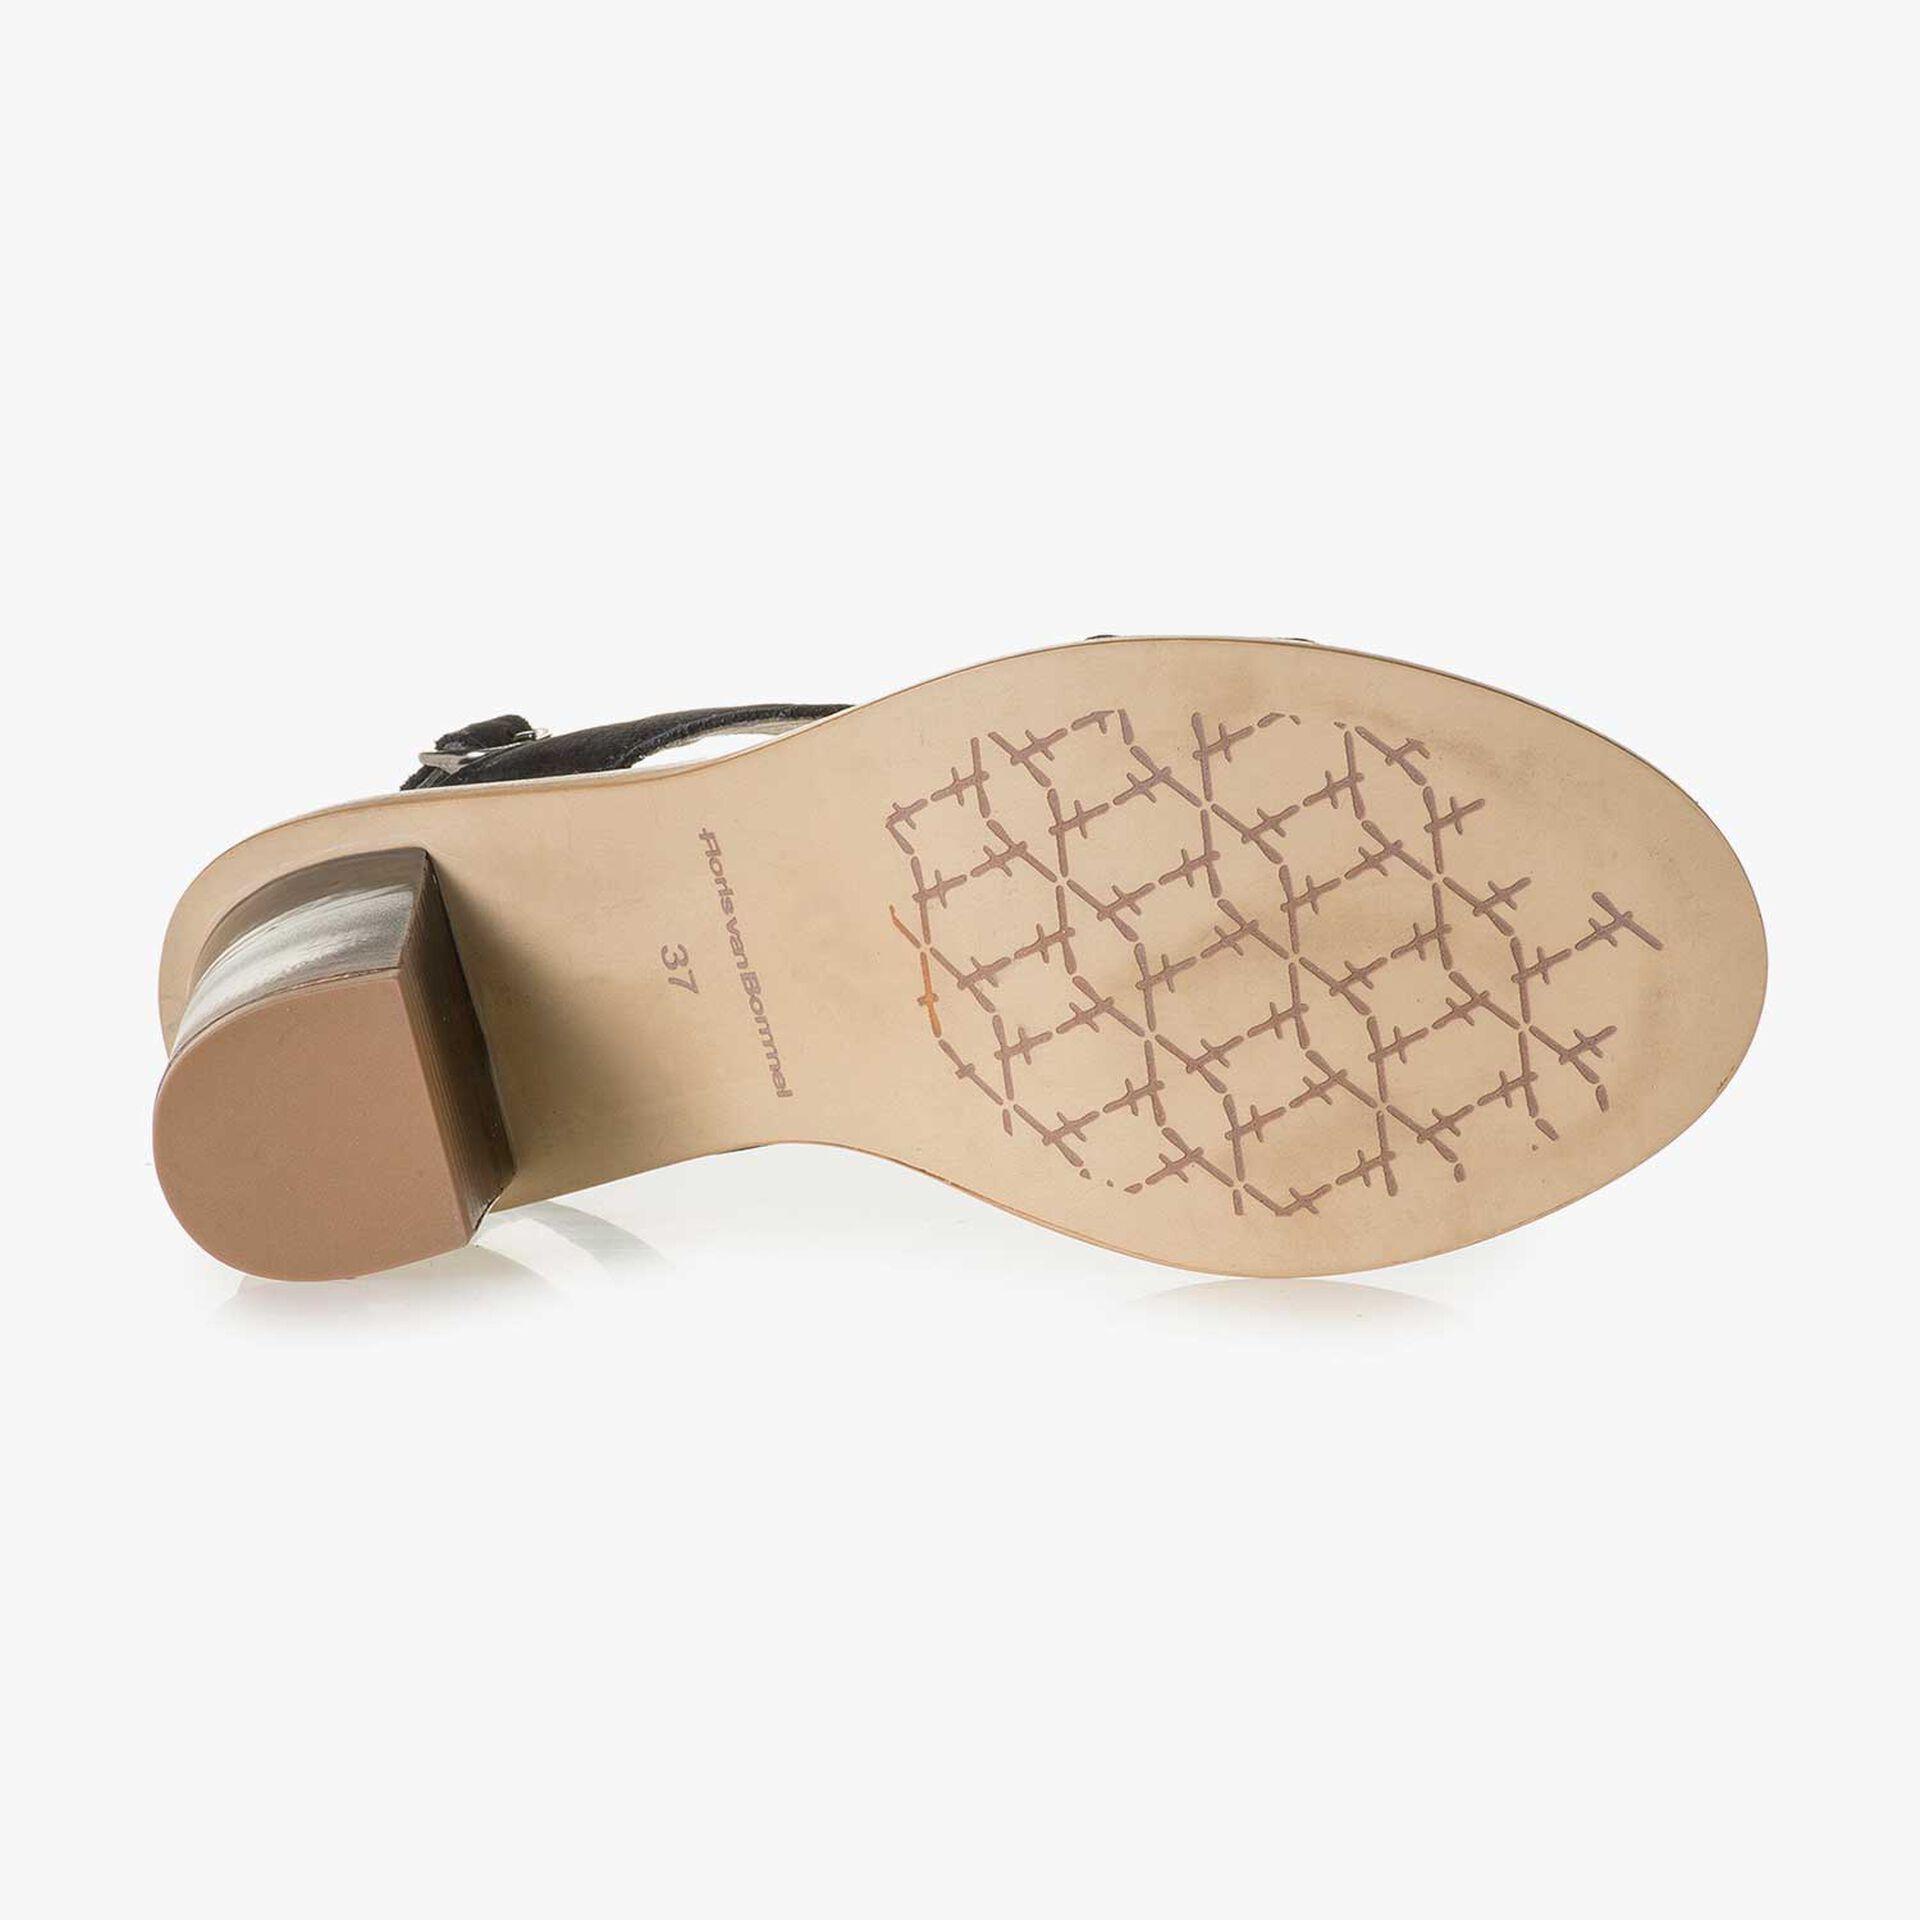 Schwarze Nubukleder-Sandale mit Keilabsatz